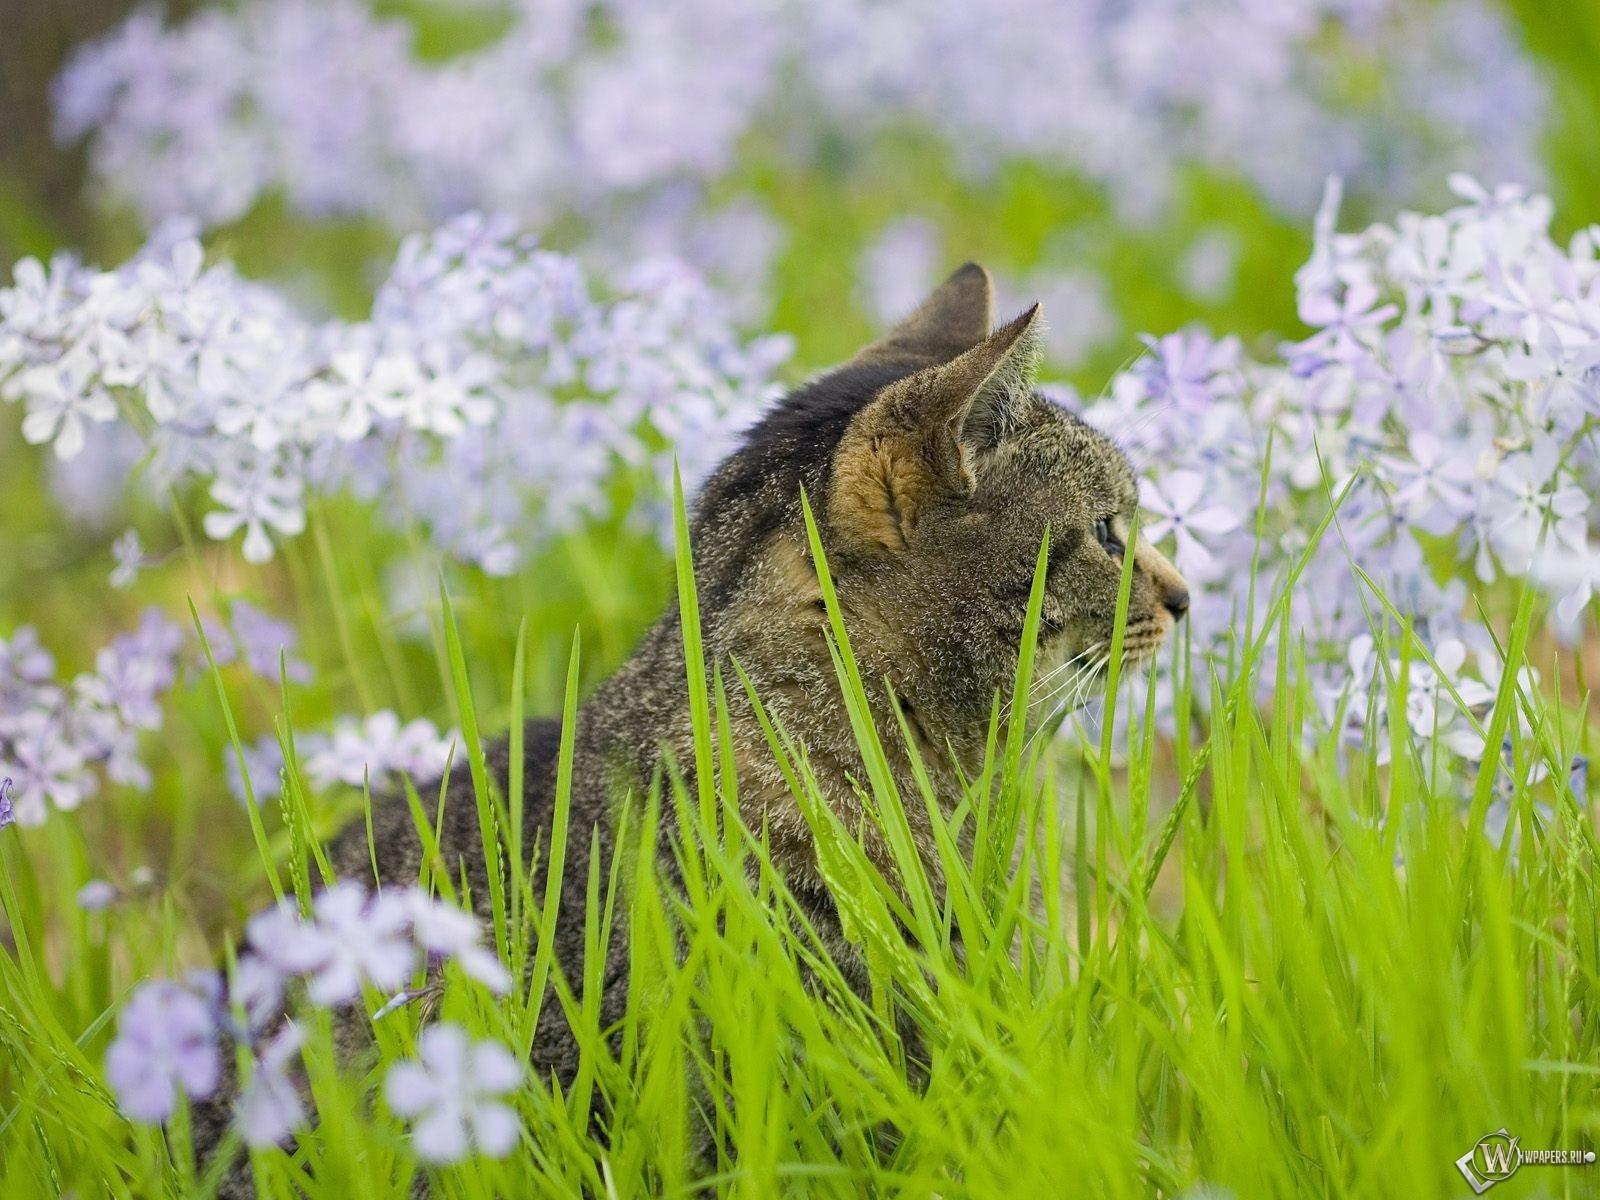 Котенок в траве 1600x1200